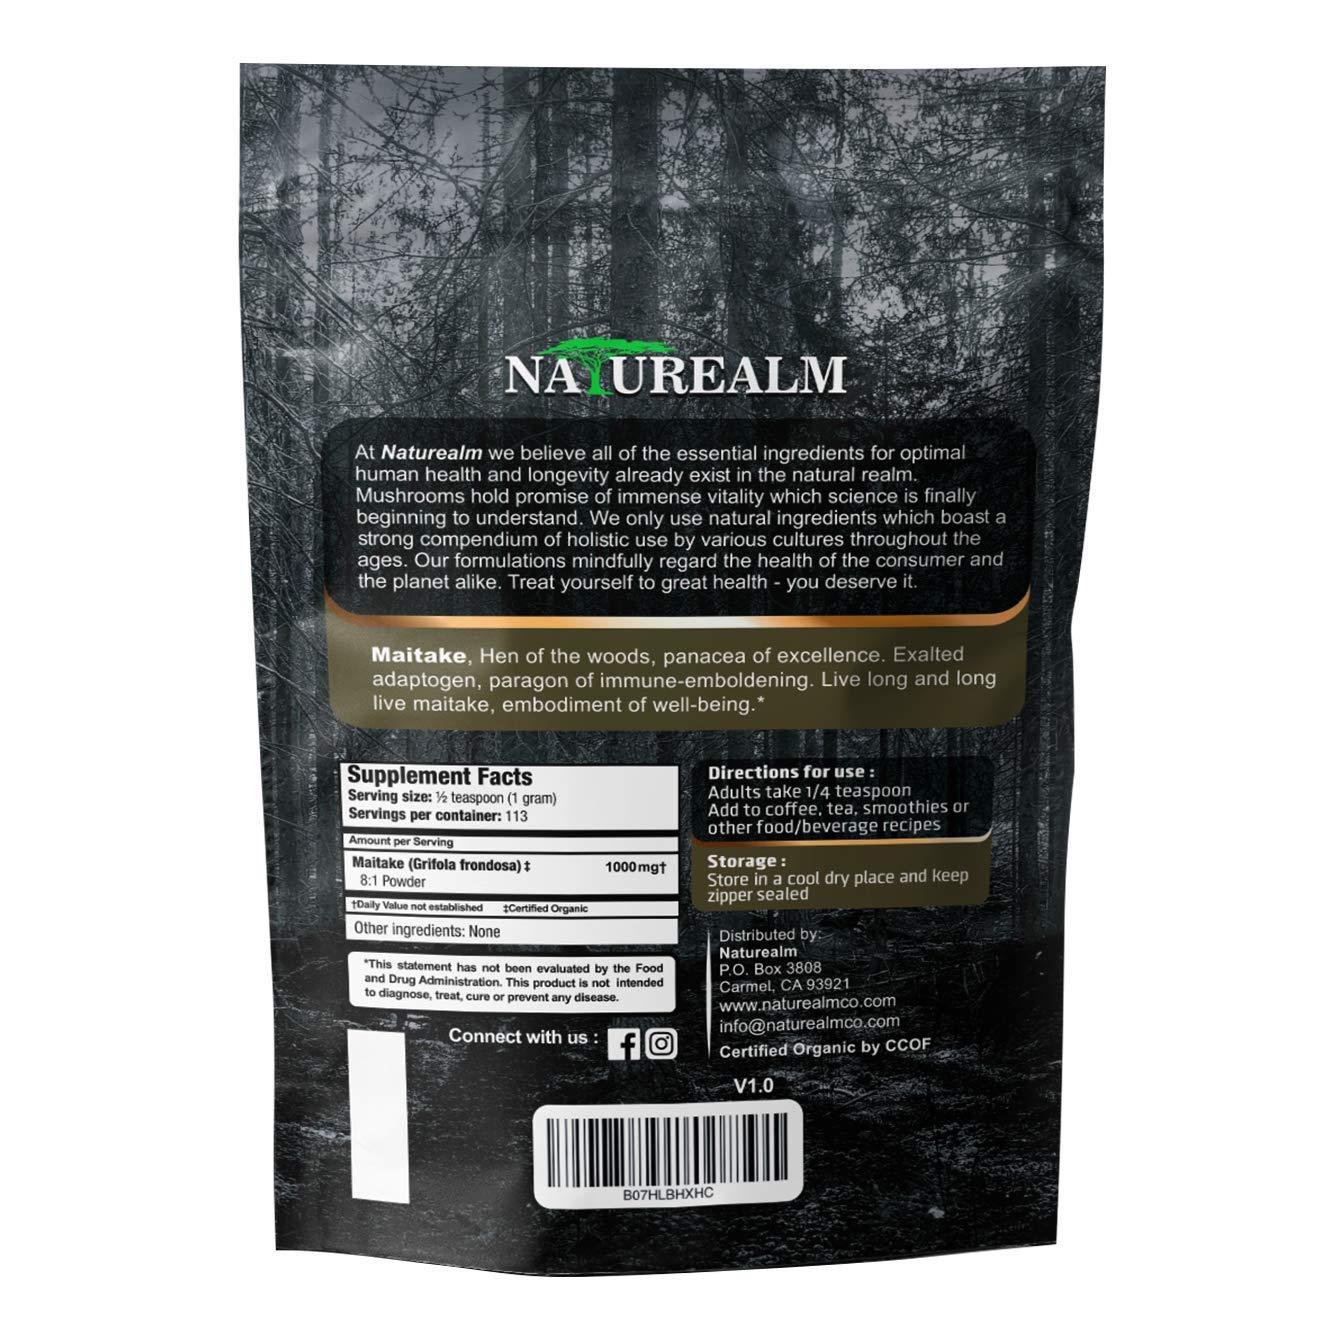 Maitake Mushroom Extract Powder – Natural Adaptogen Supplement – Immune Support, Blood Sugar Regulation, Cellular Health – 100 Whole Mushrooms – USDA Certified Organic – 4oz. 113g